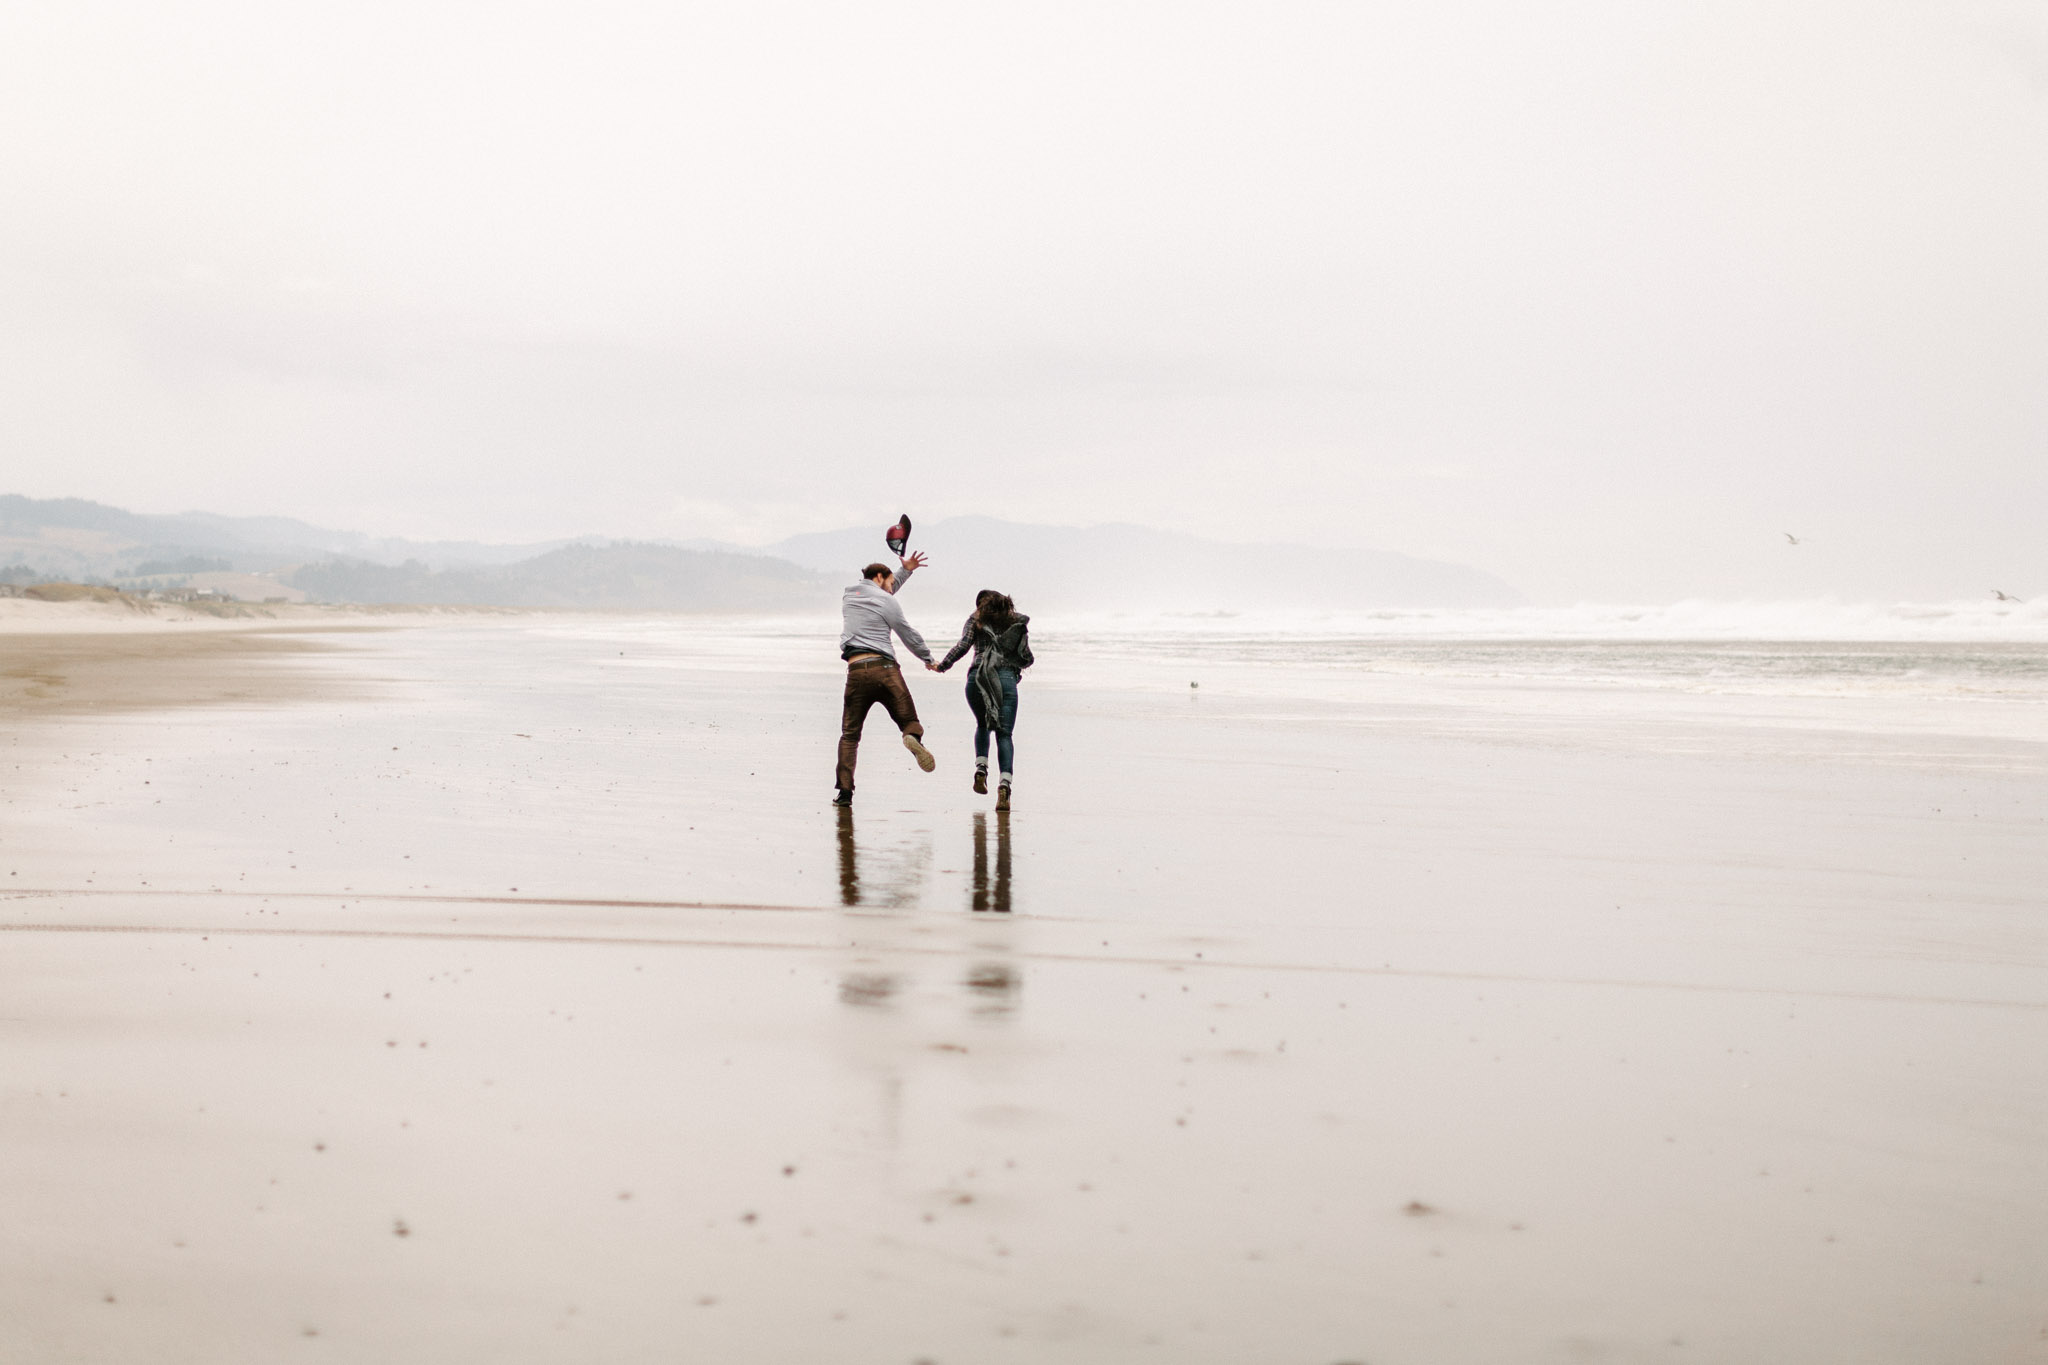 Oregon-Cape-Kiwanda-Engagement-Pia-Anna-Christian-Wedding-Photography-PNW-CJ-14.jpg